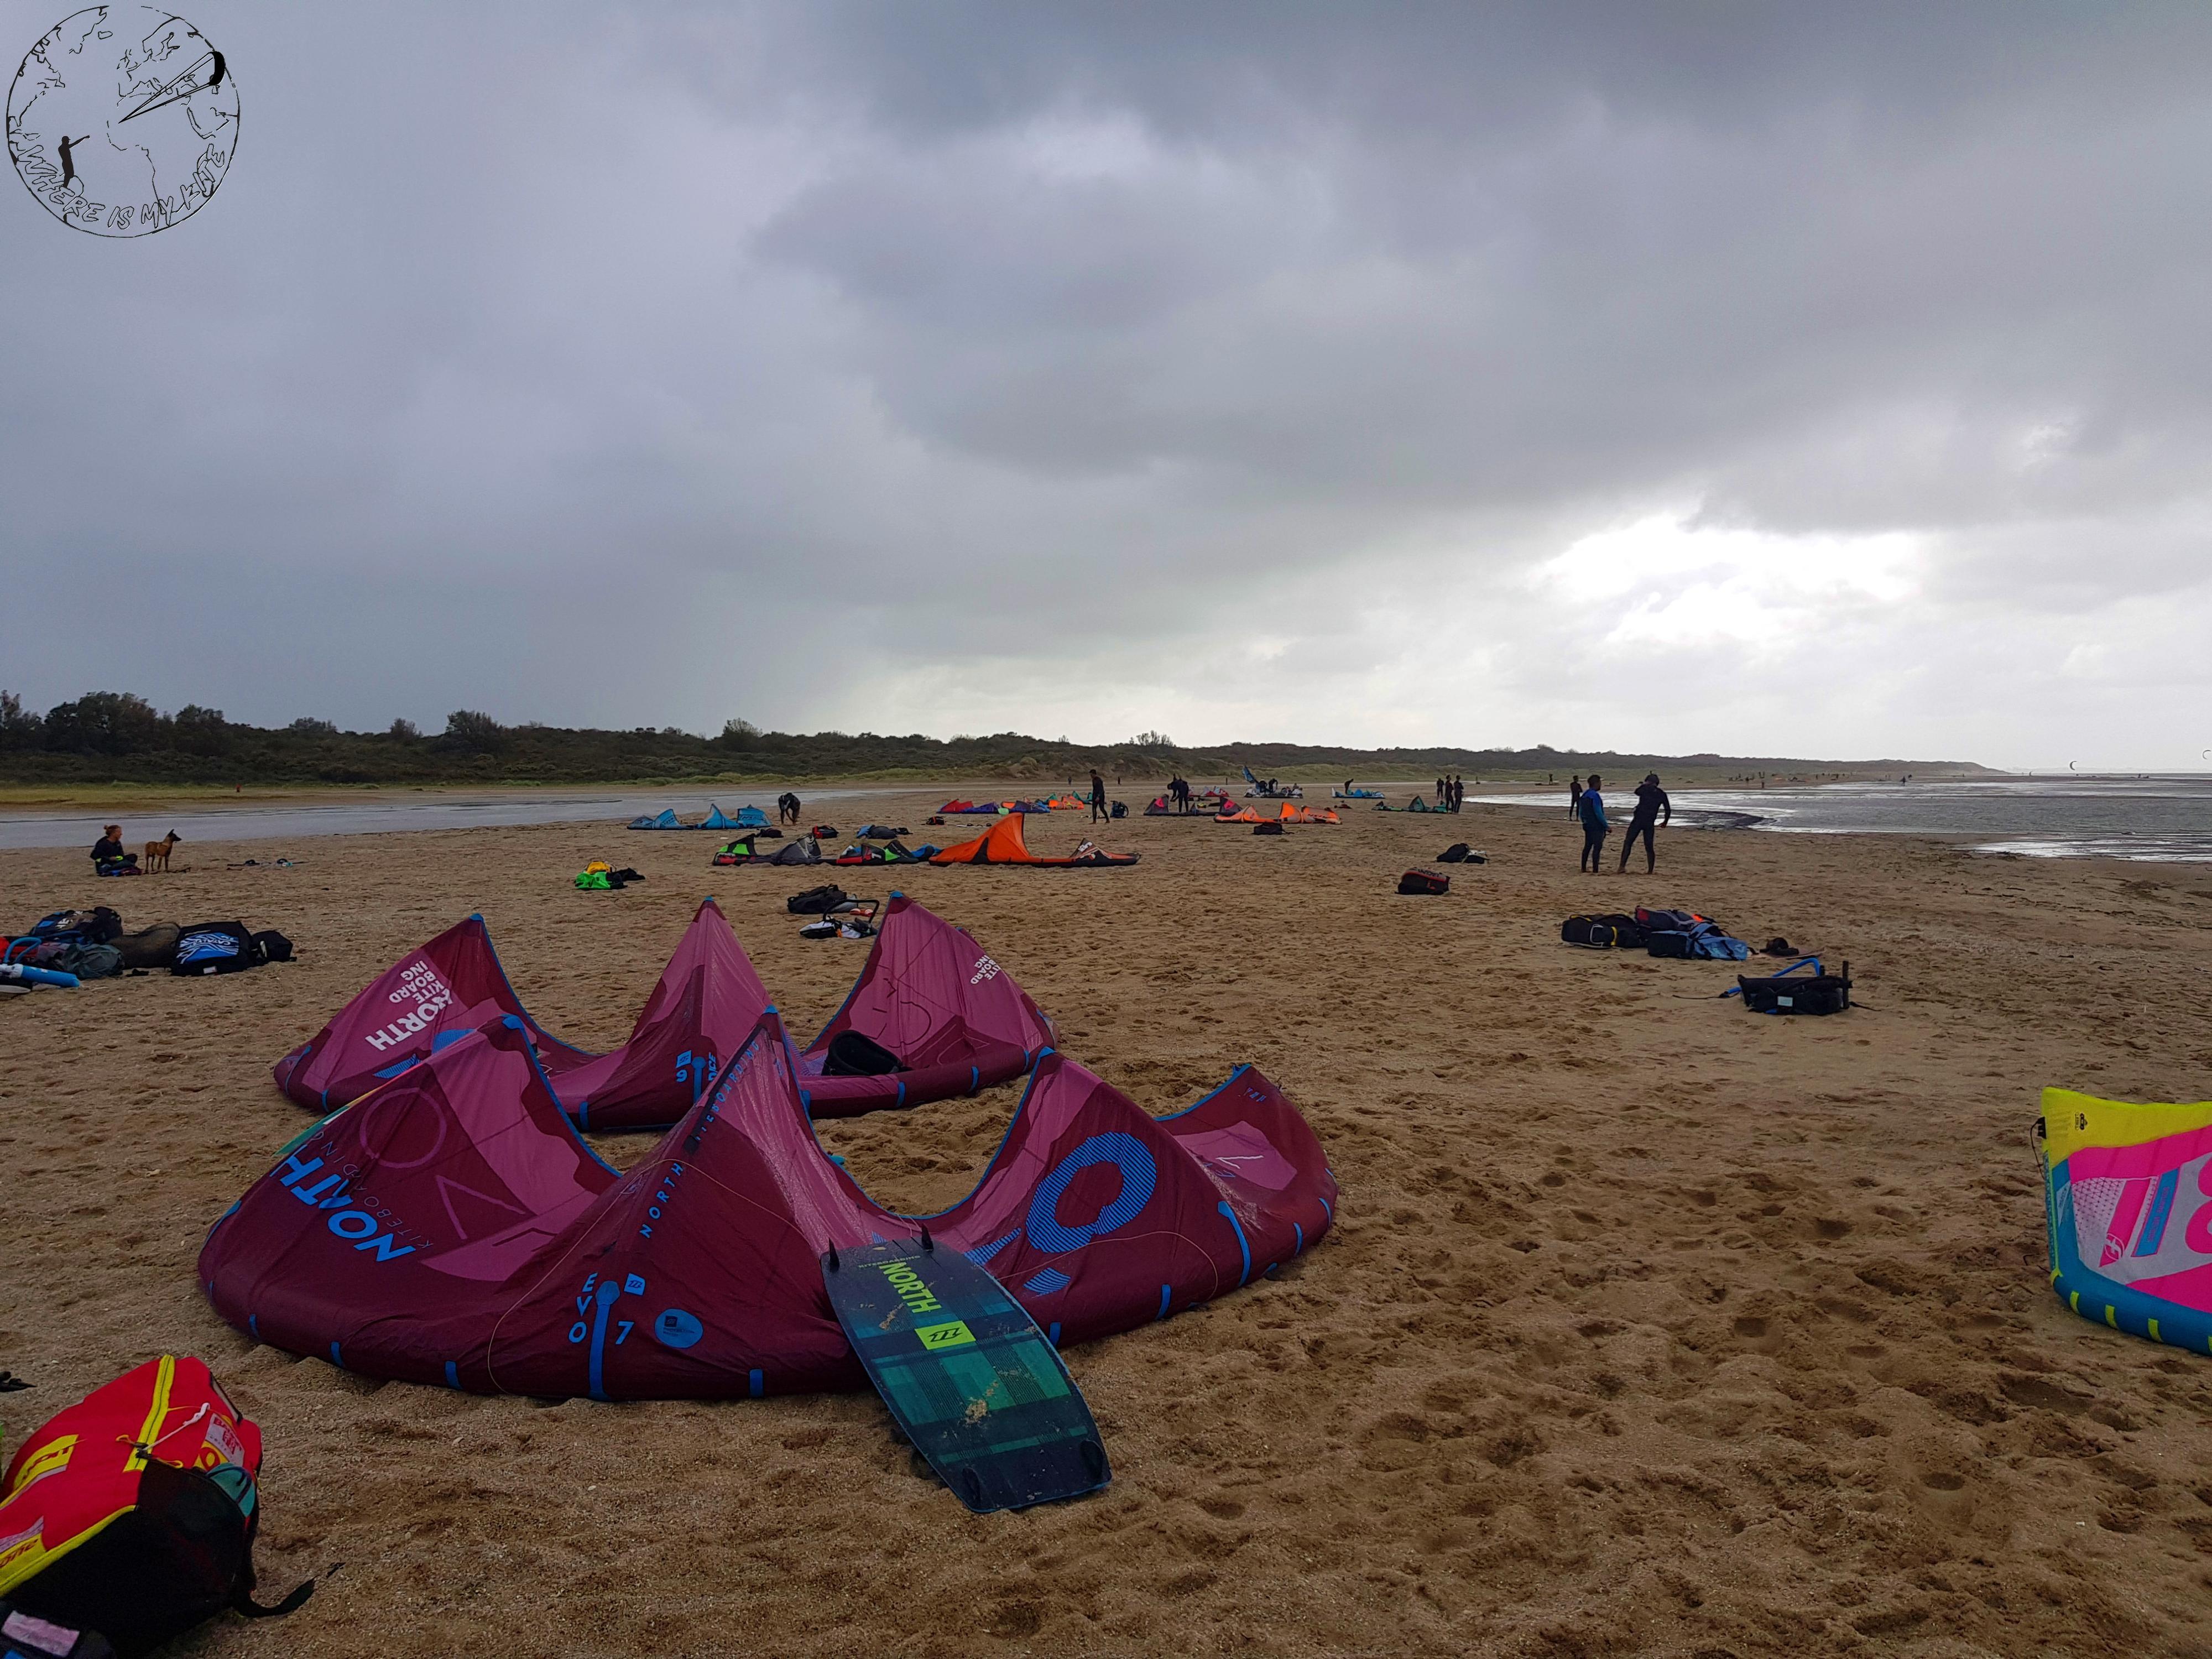 Spot de kitesurf en Hollande, Ostvoorne, kite trip en van, stockage des ailes